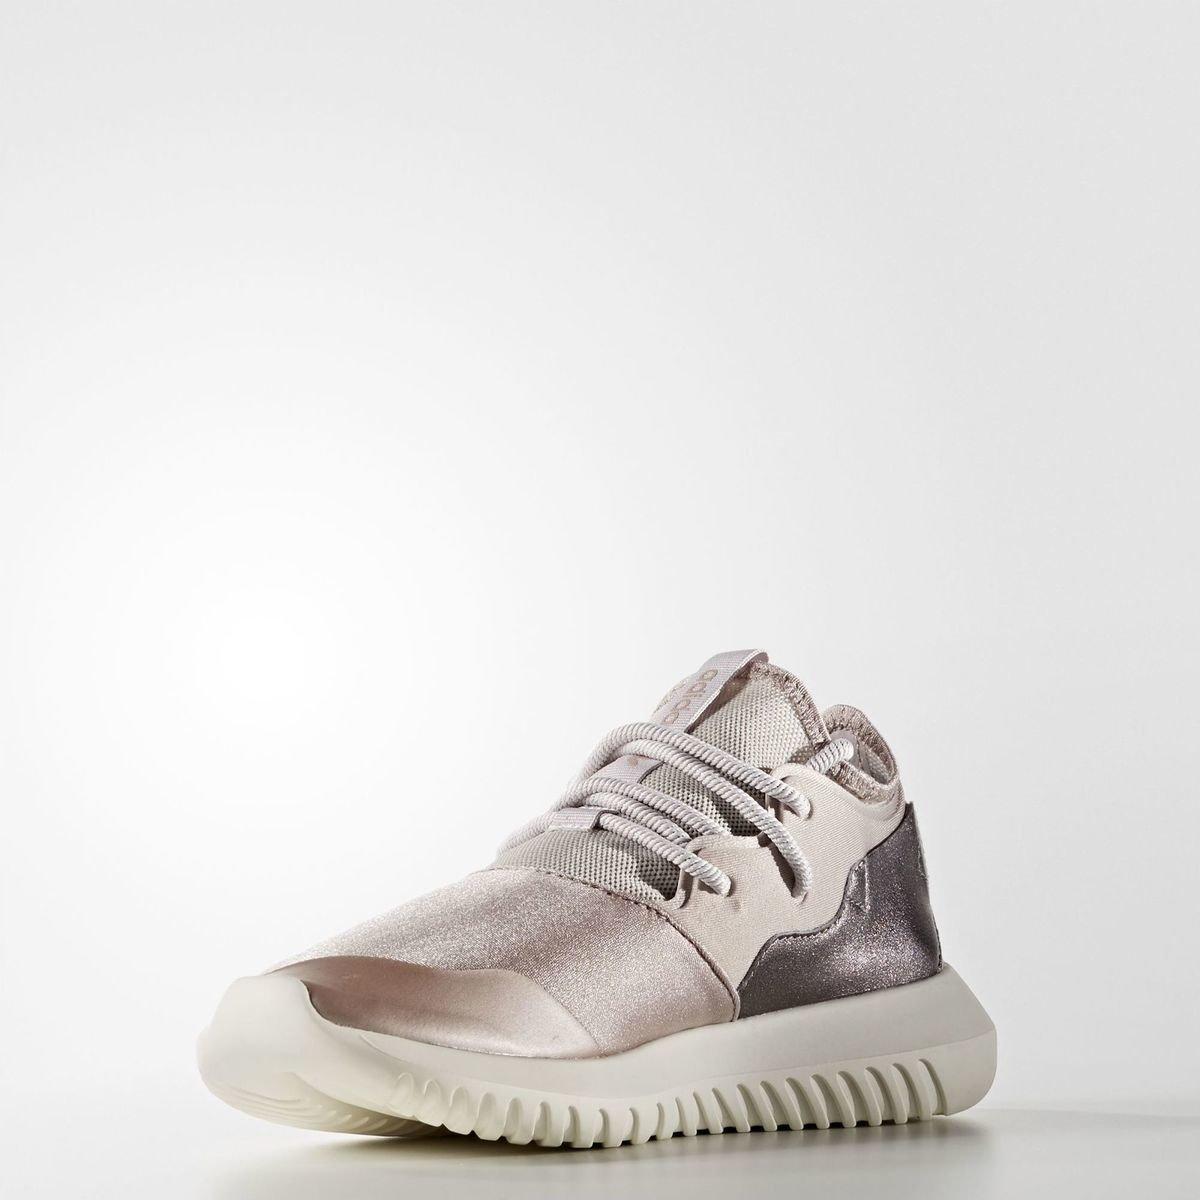 Chaussures Adidas Tubular Entrap W sepQWl0T